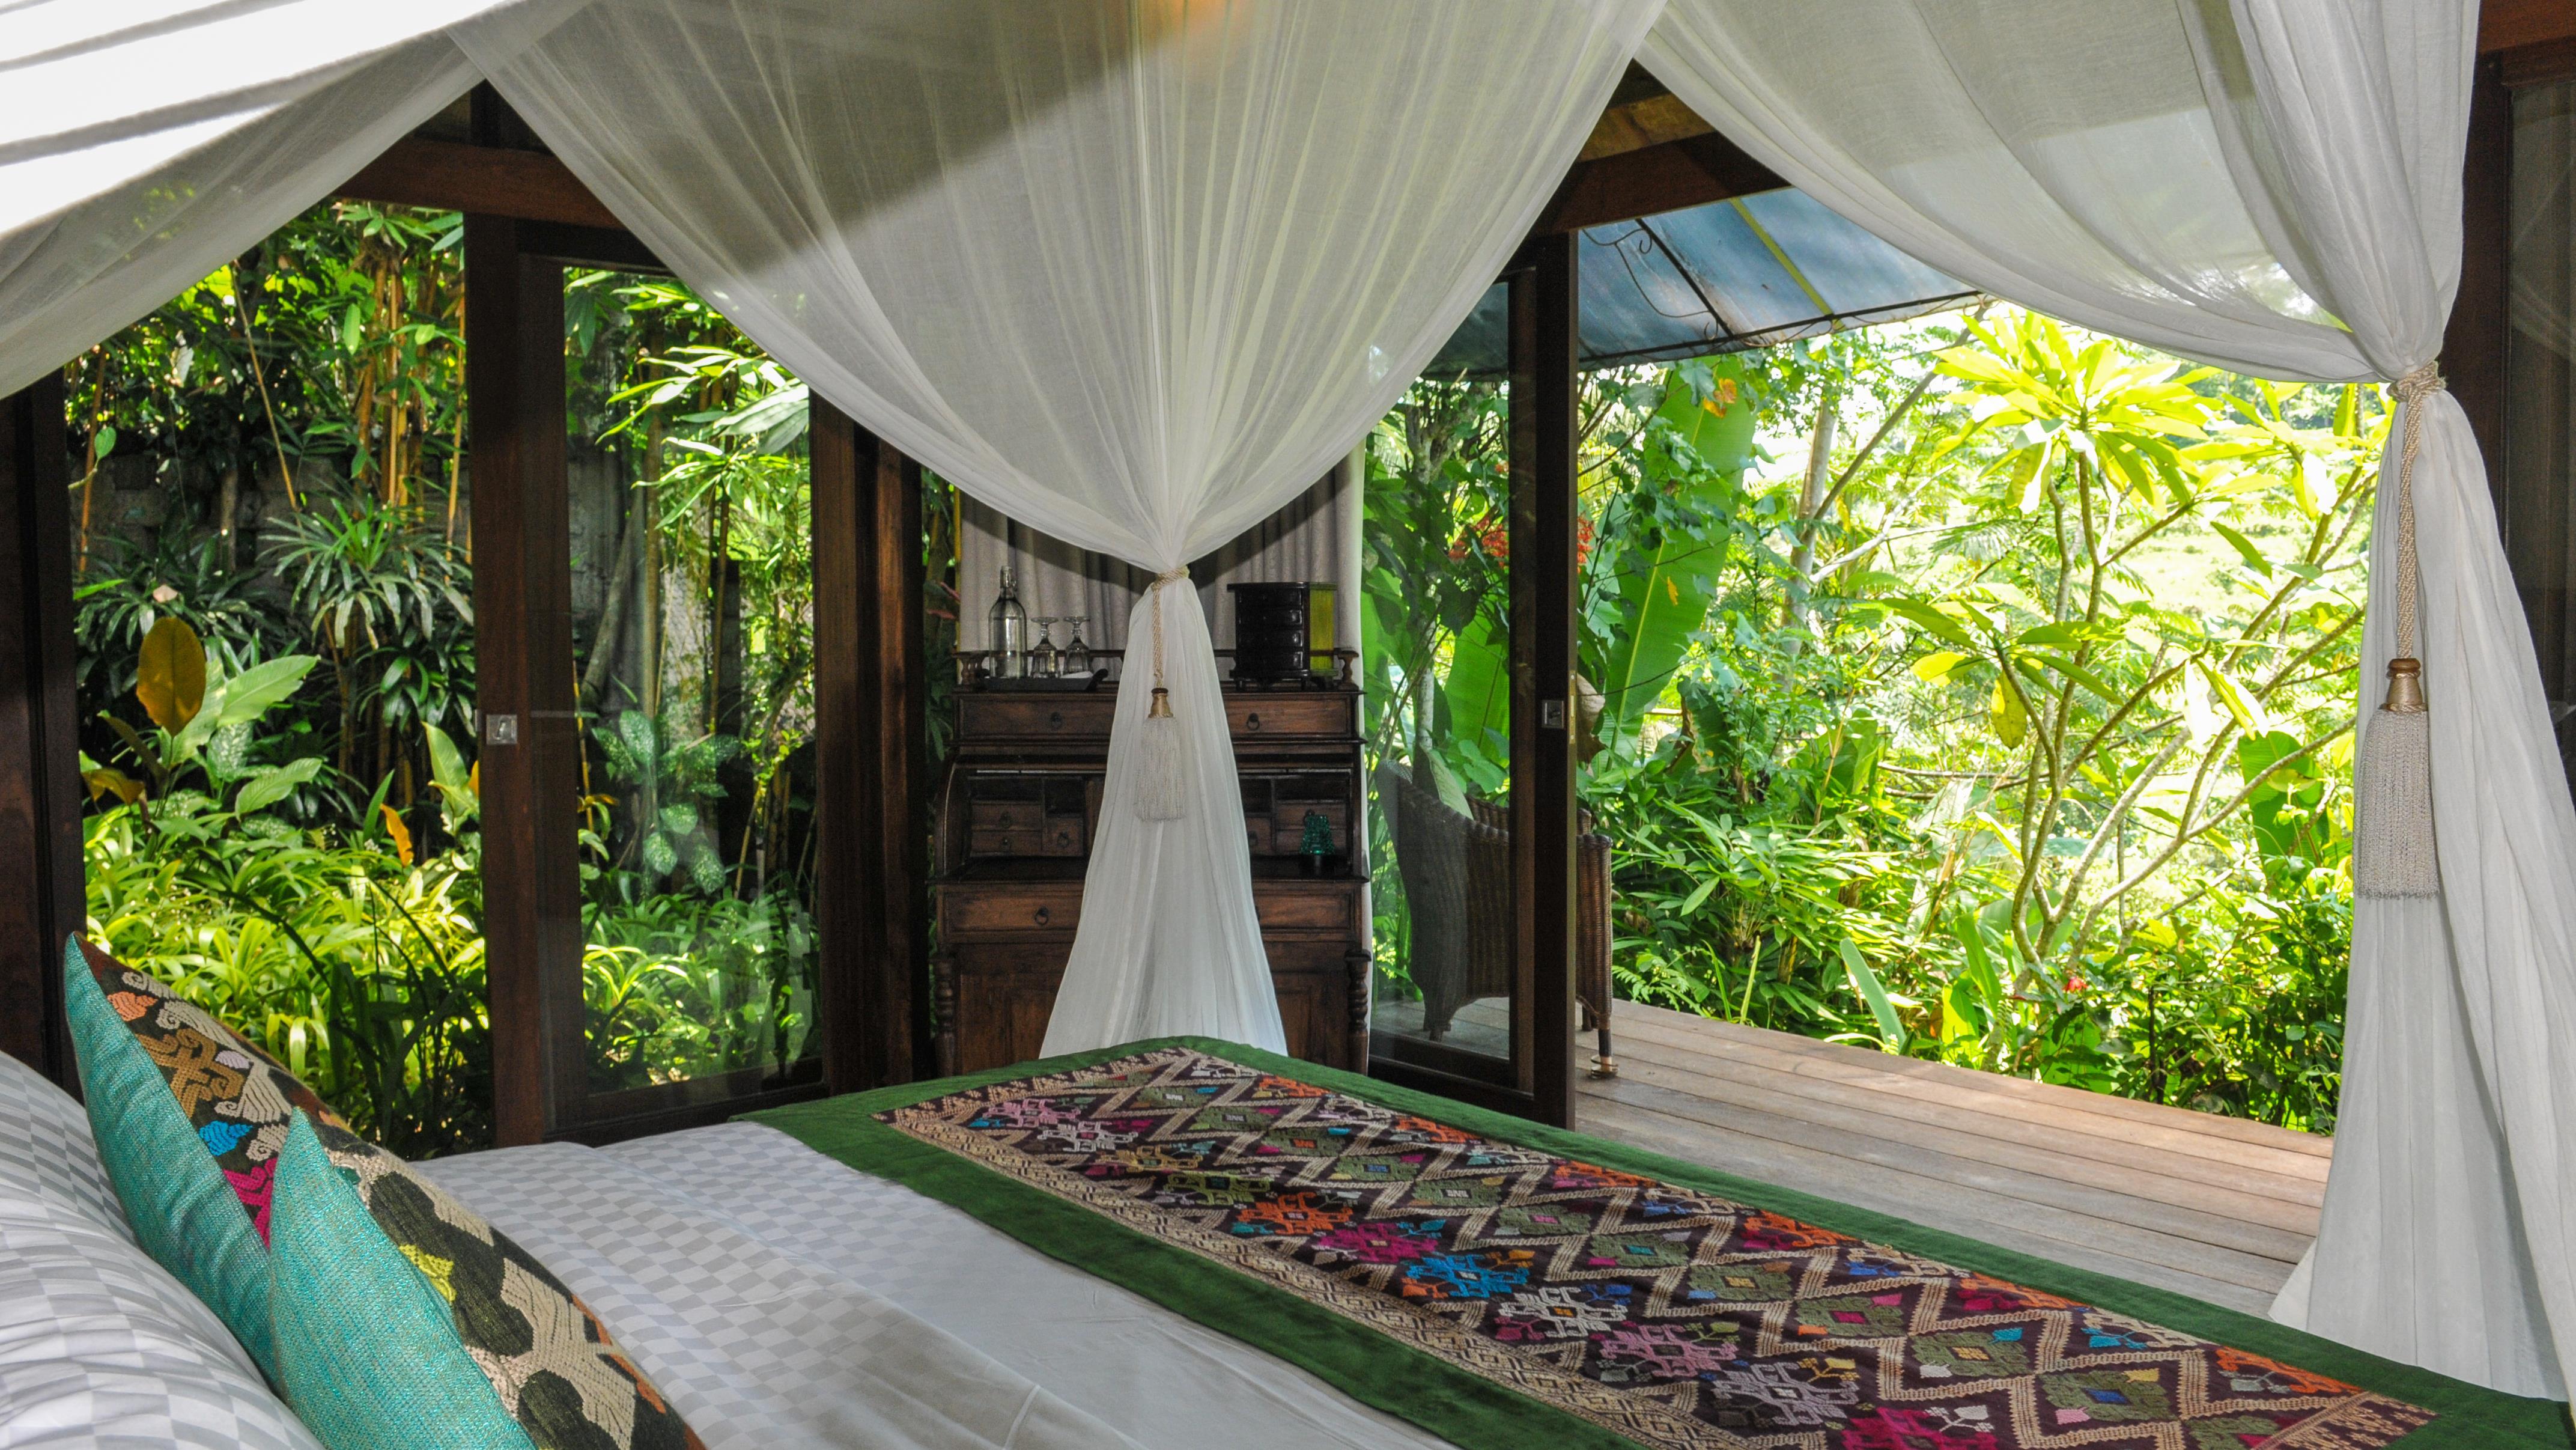 Bedroom with Outdoor View - Villa Umah Shanti - Ubud, Bali